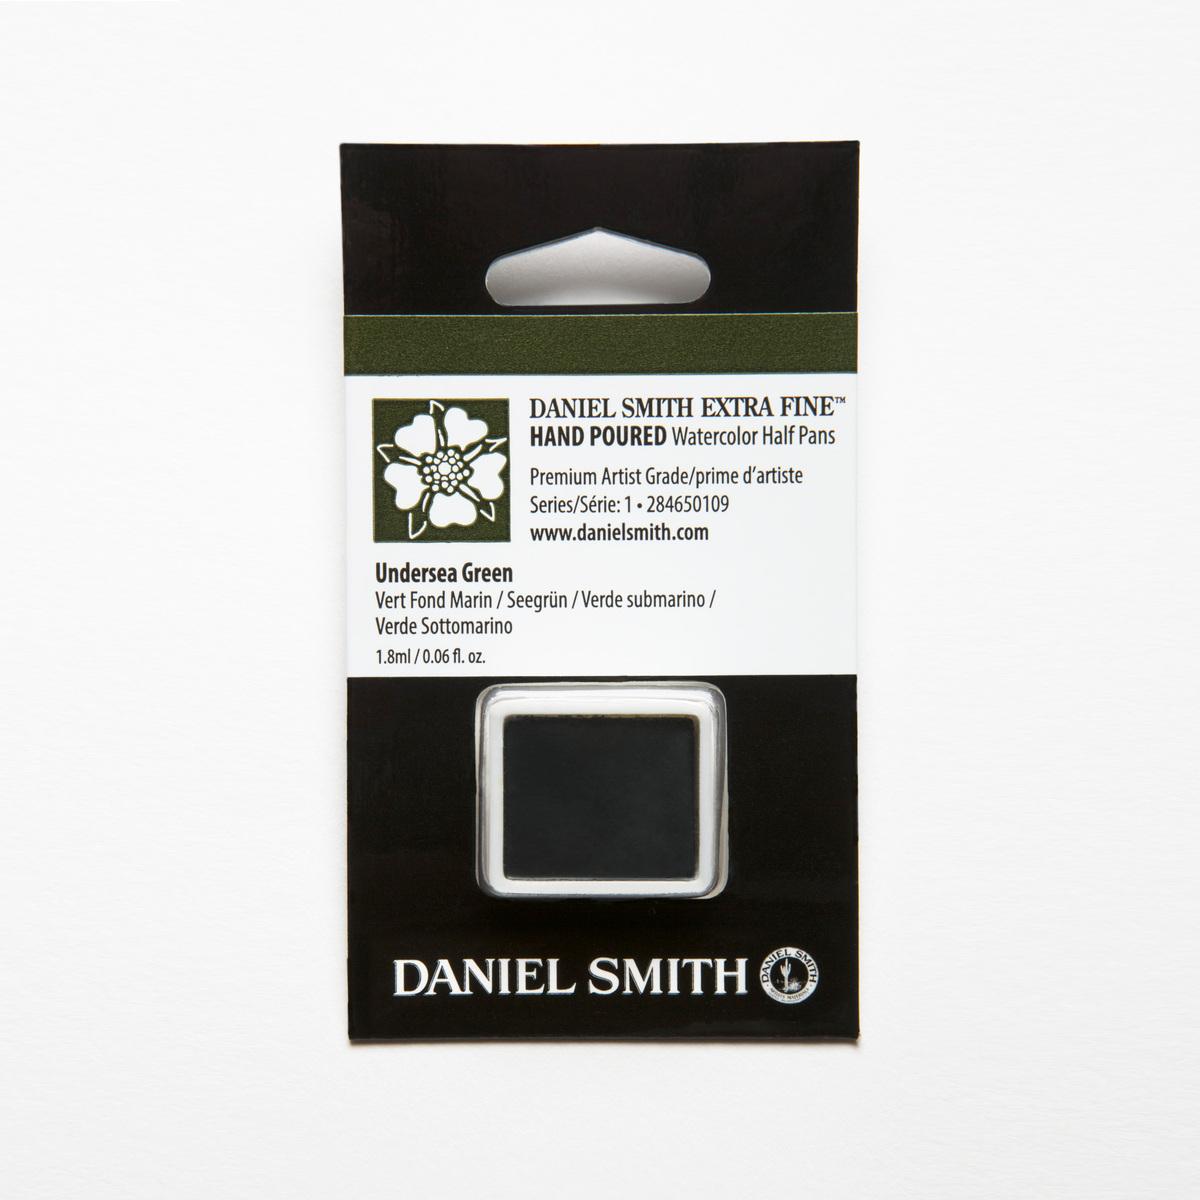 DANIEL SMITH アンダーシーグリーン Undersea Green ダニエル 水彩絵具 百貨店 超目玉 ハーフパン スミス